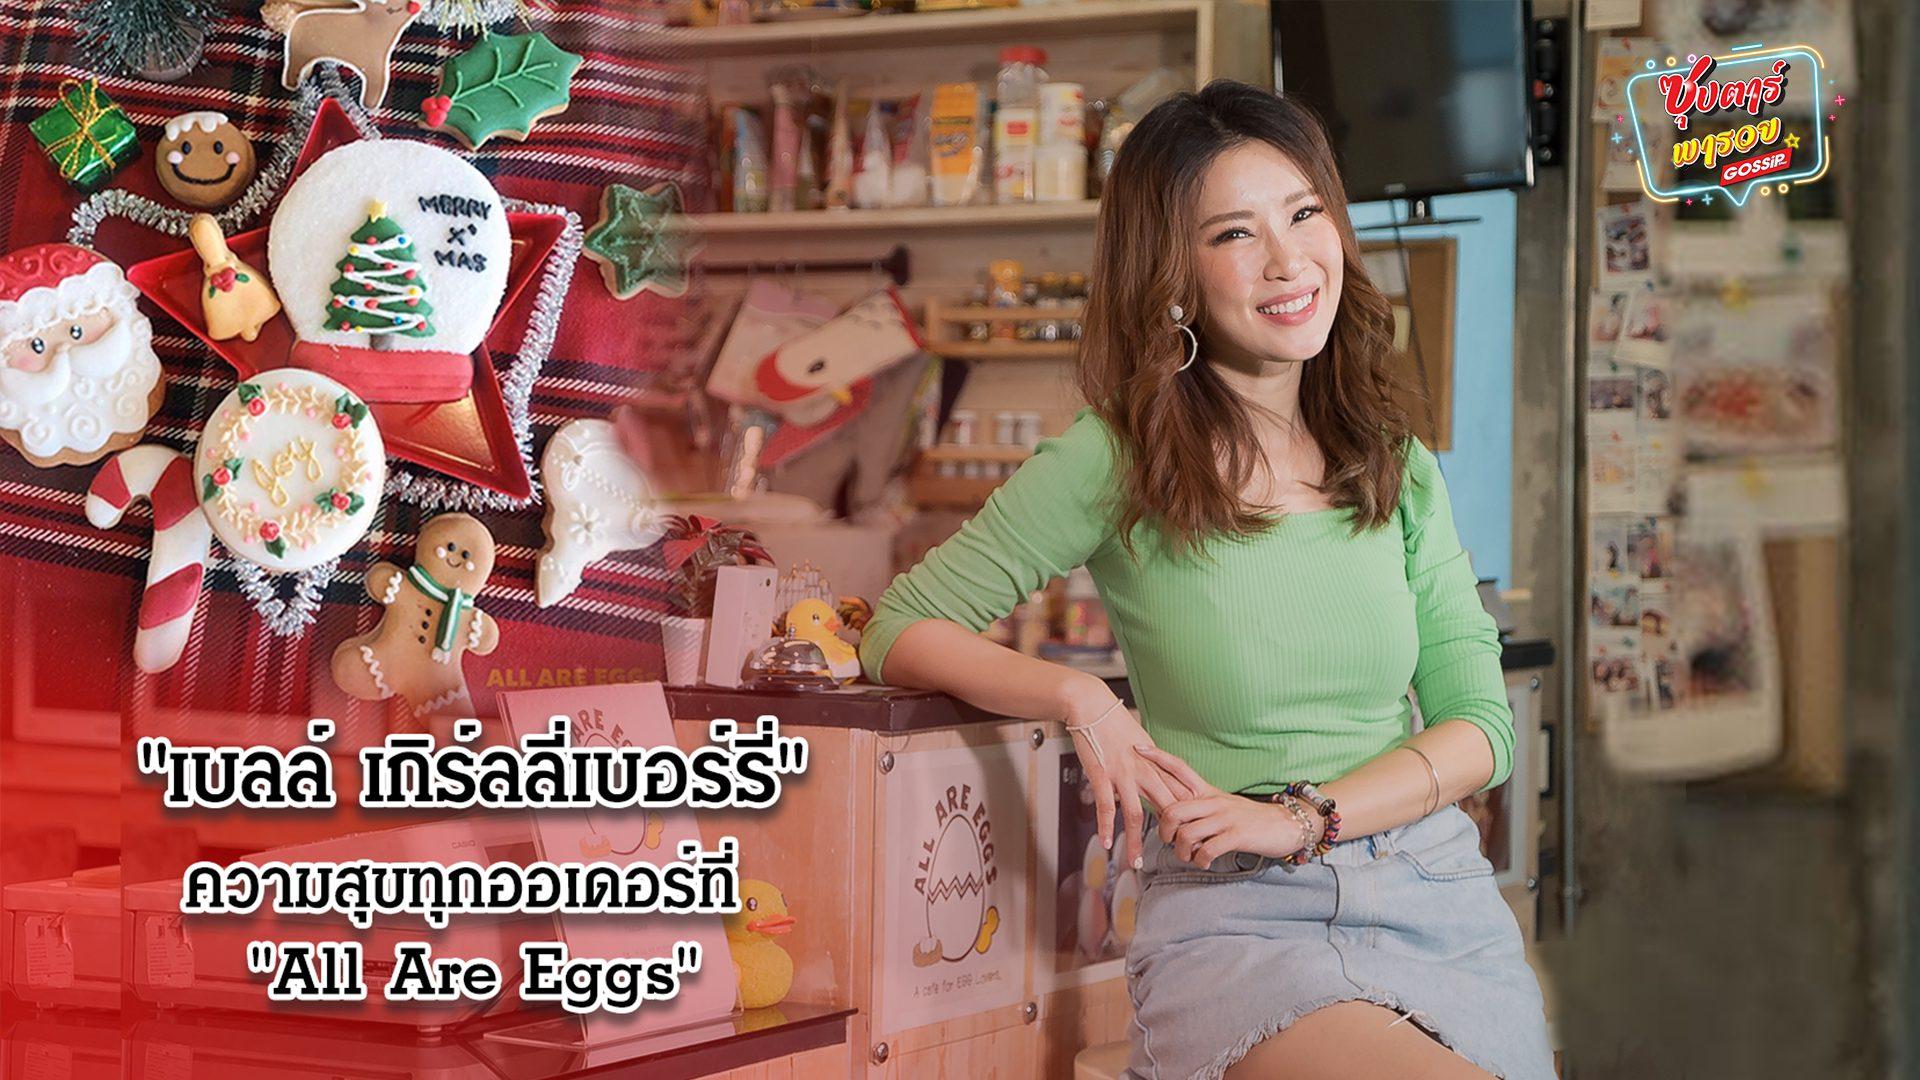 All Are Eggs เบลล์ มนัญญา ลิ่มเสถียร